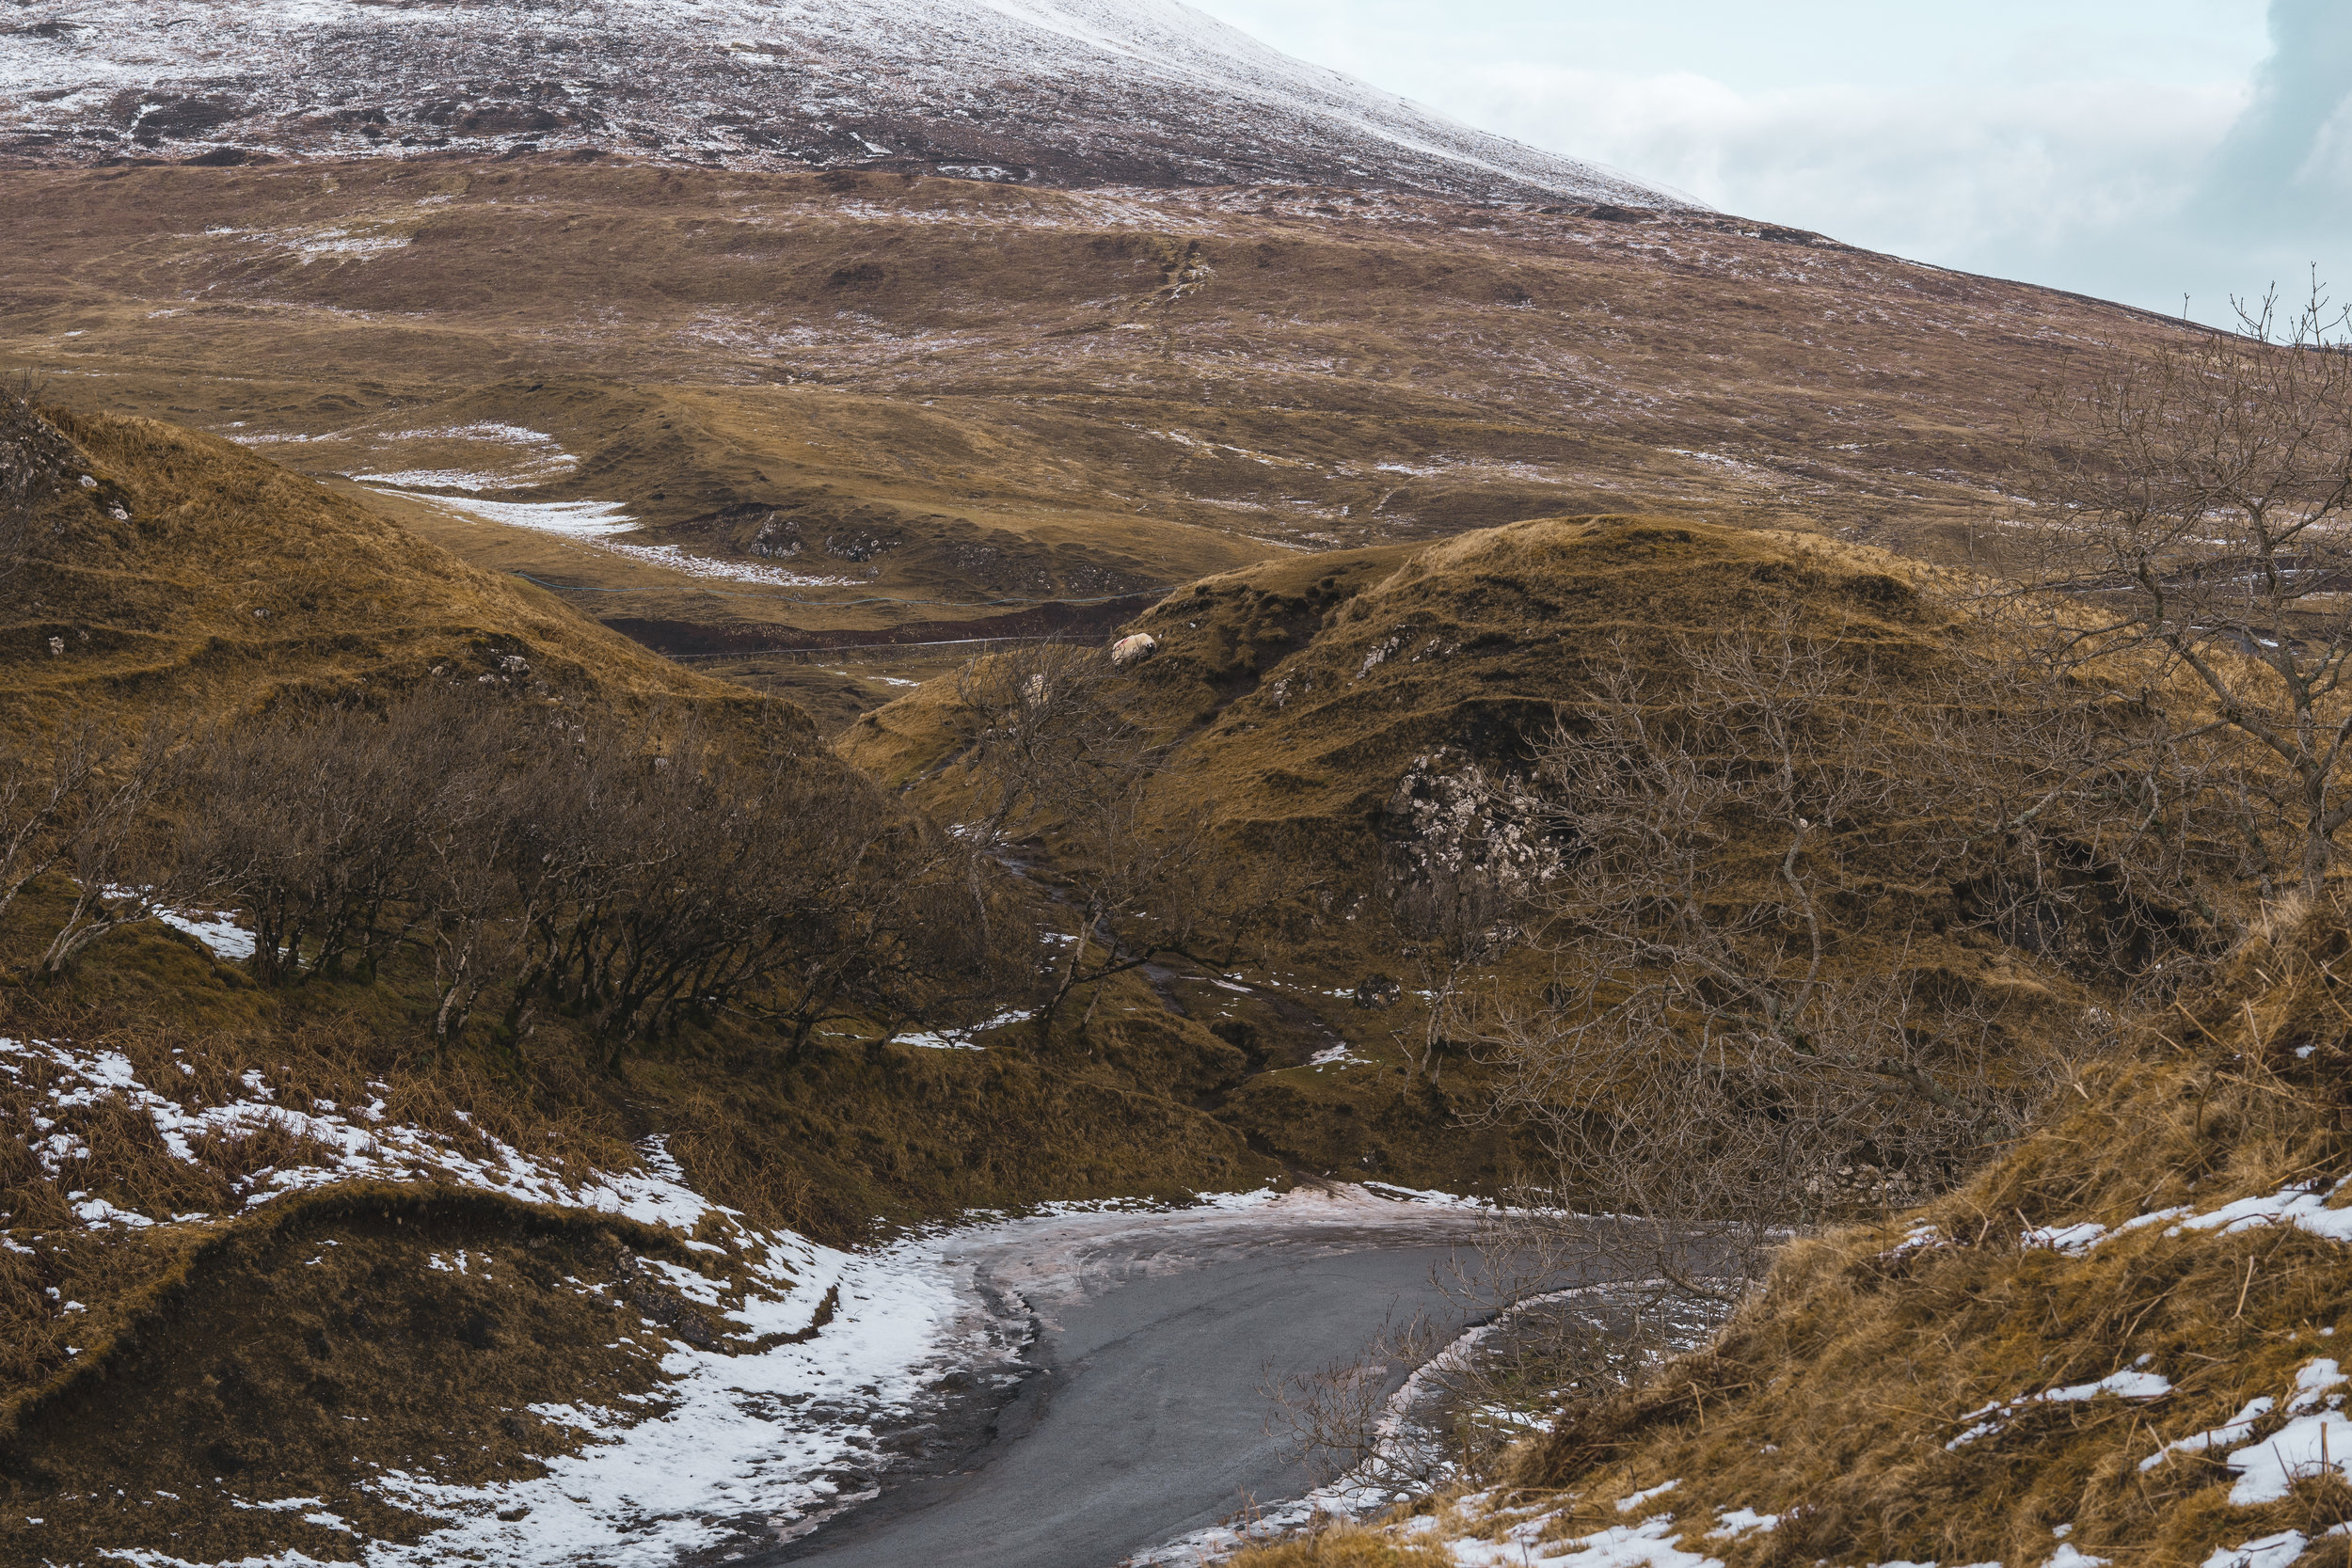 Isle-of-Skye-Fairy-Glen-und-Braes (17).jpg